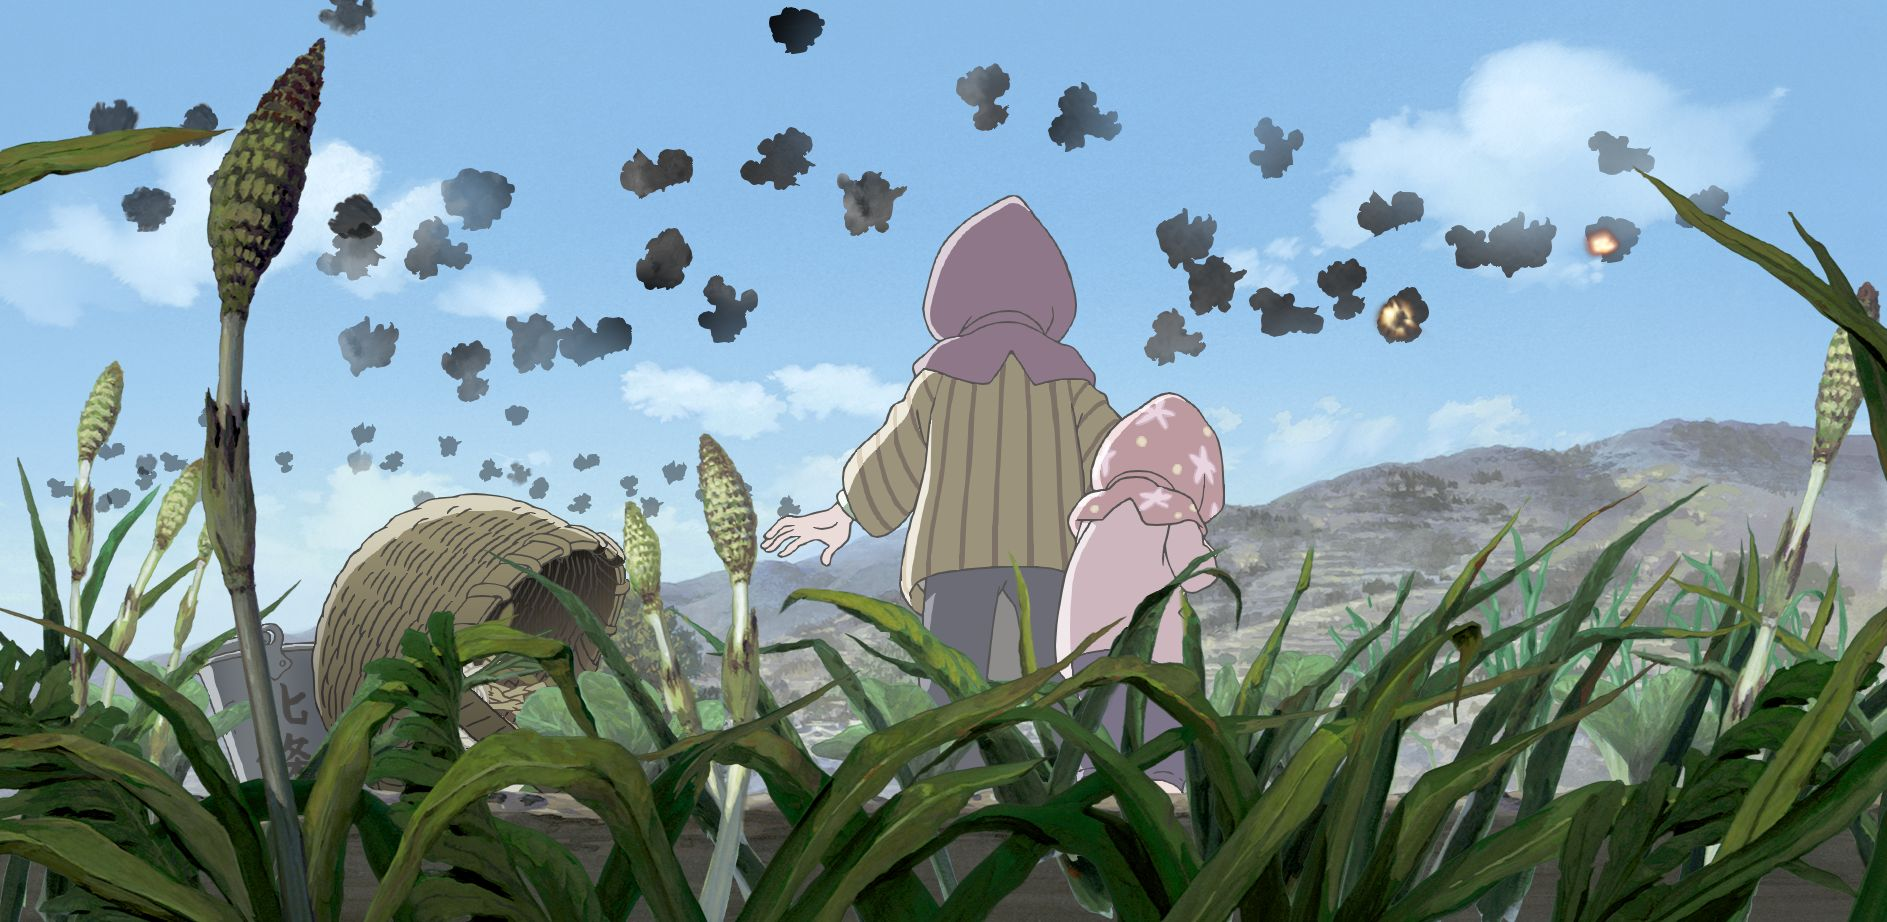 Sunao Katabuchi on His Award-Winning Animation 'In This Corner of the World'